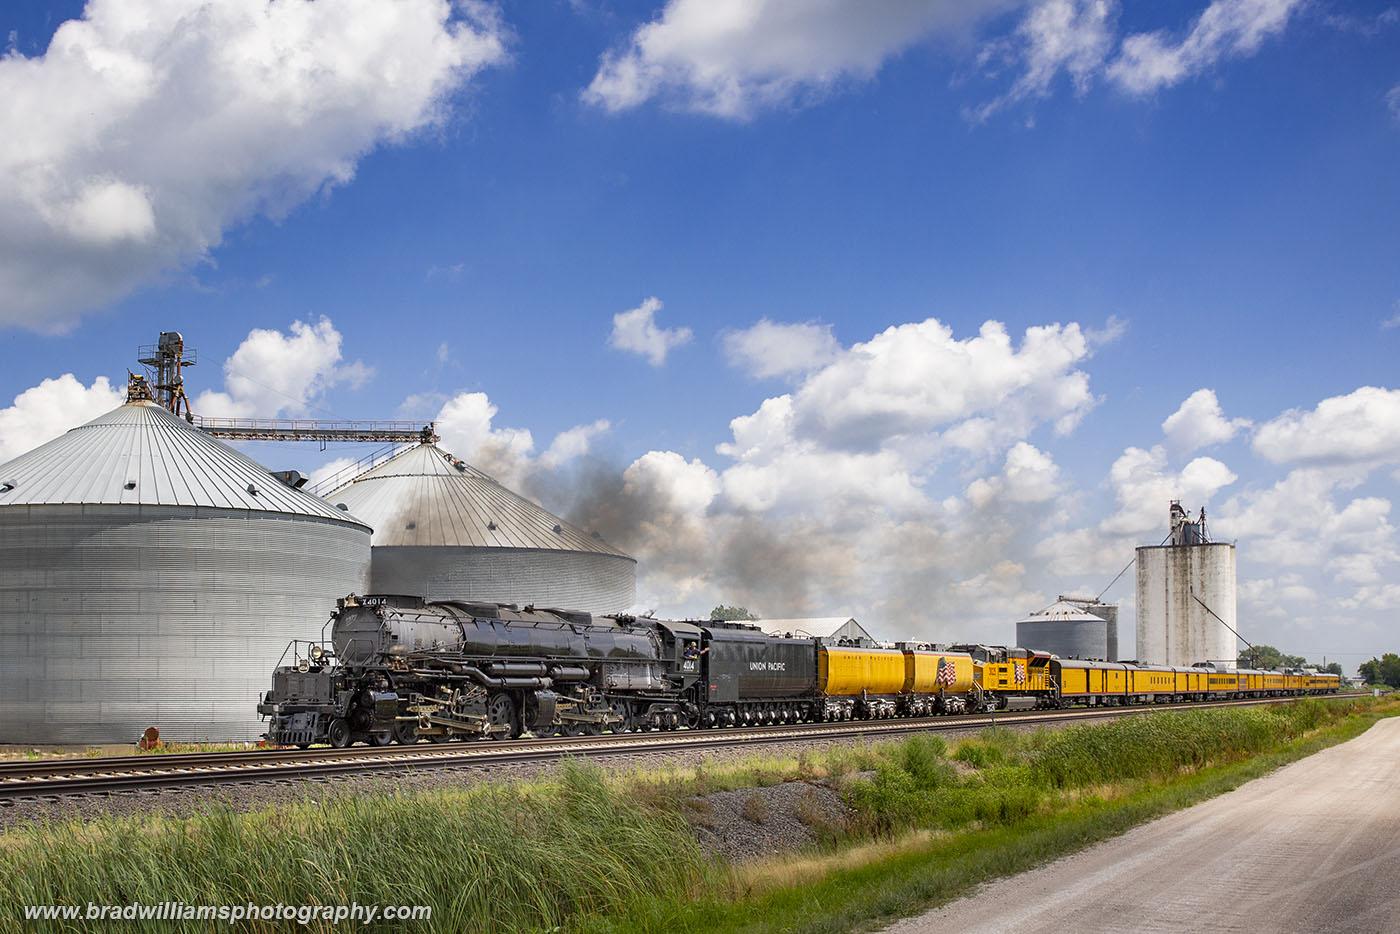 Union Pacific BigBoy 4014 westbound through North Bend, Nebraska in the Summer of 2019.